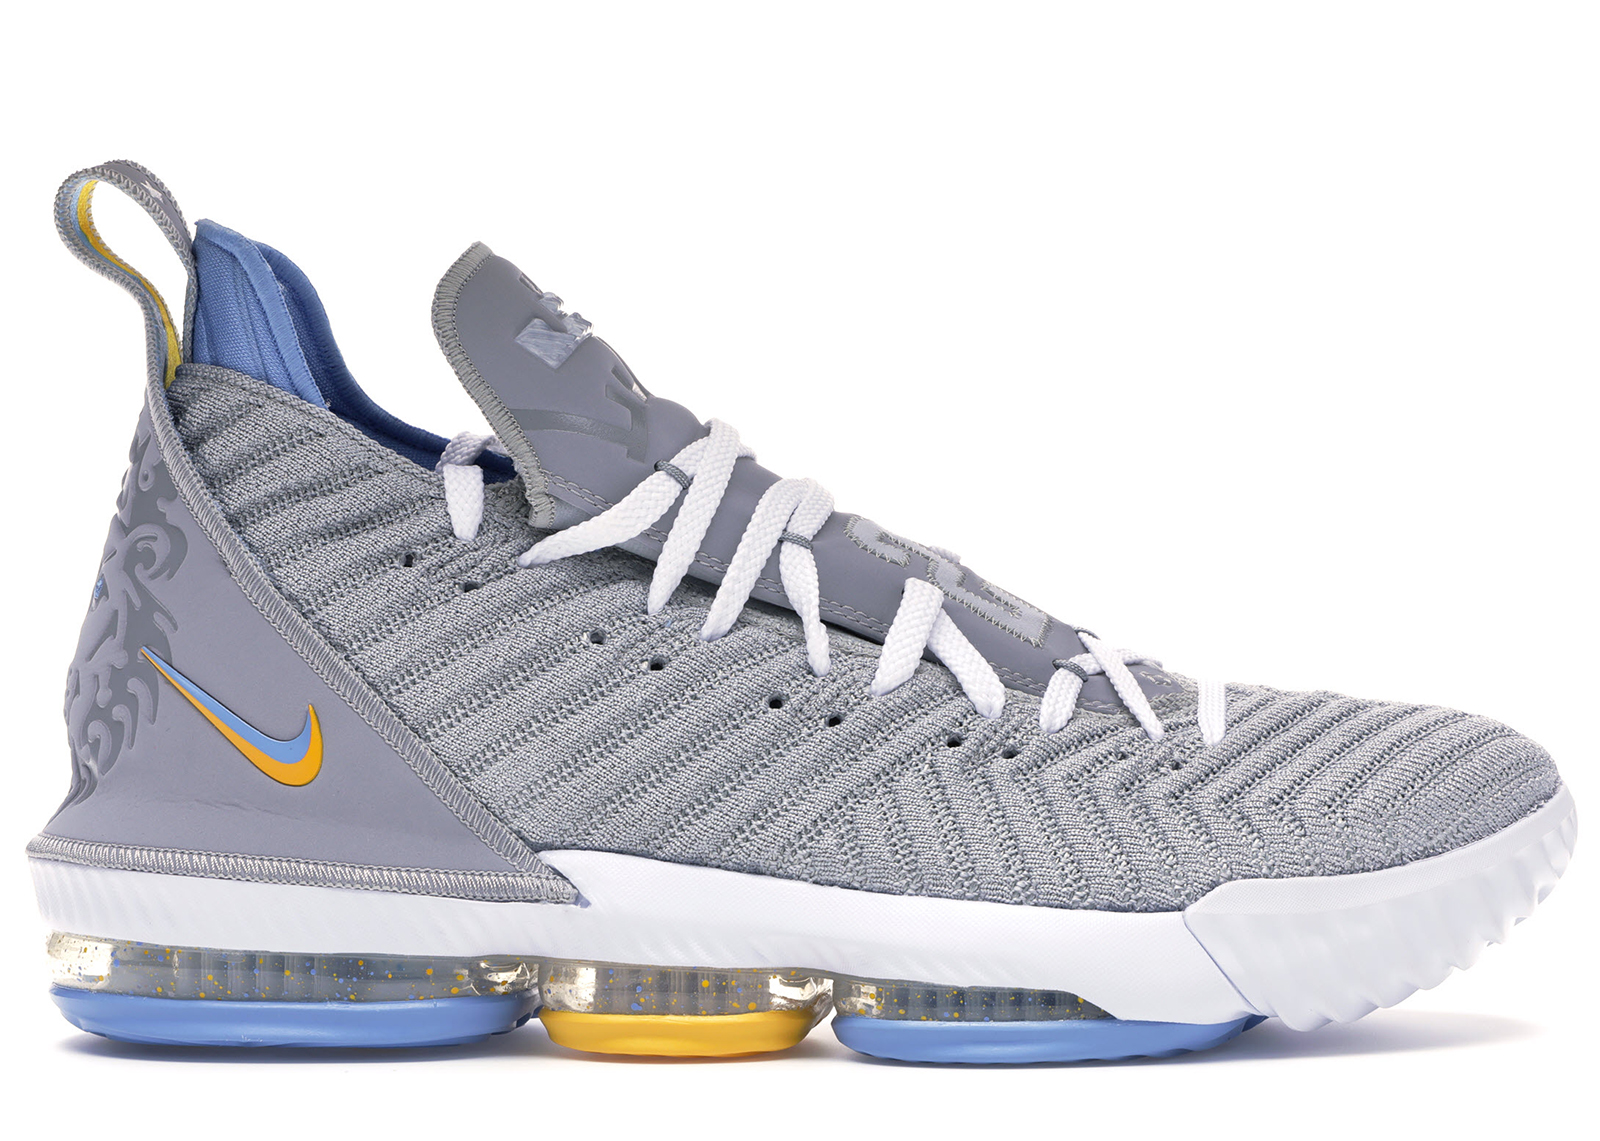 Nike LeBron 16 MPLS Lakers - CK4765-001